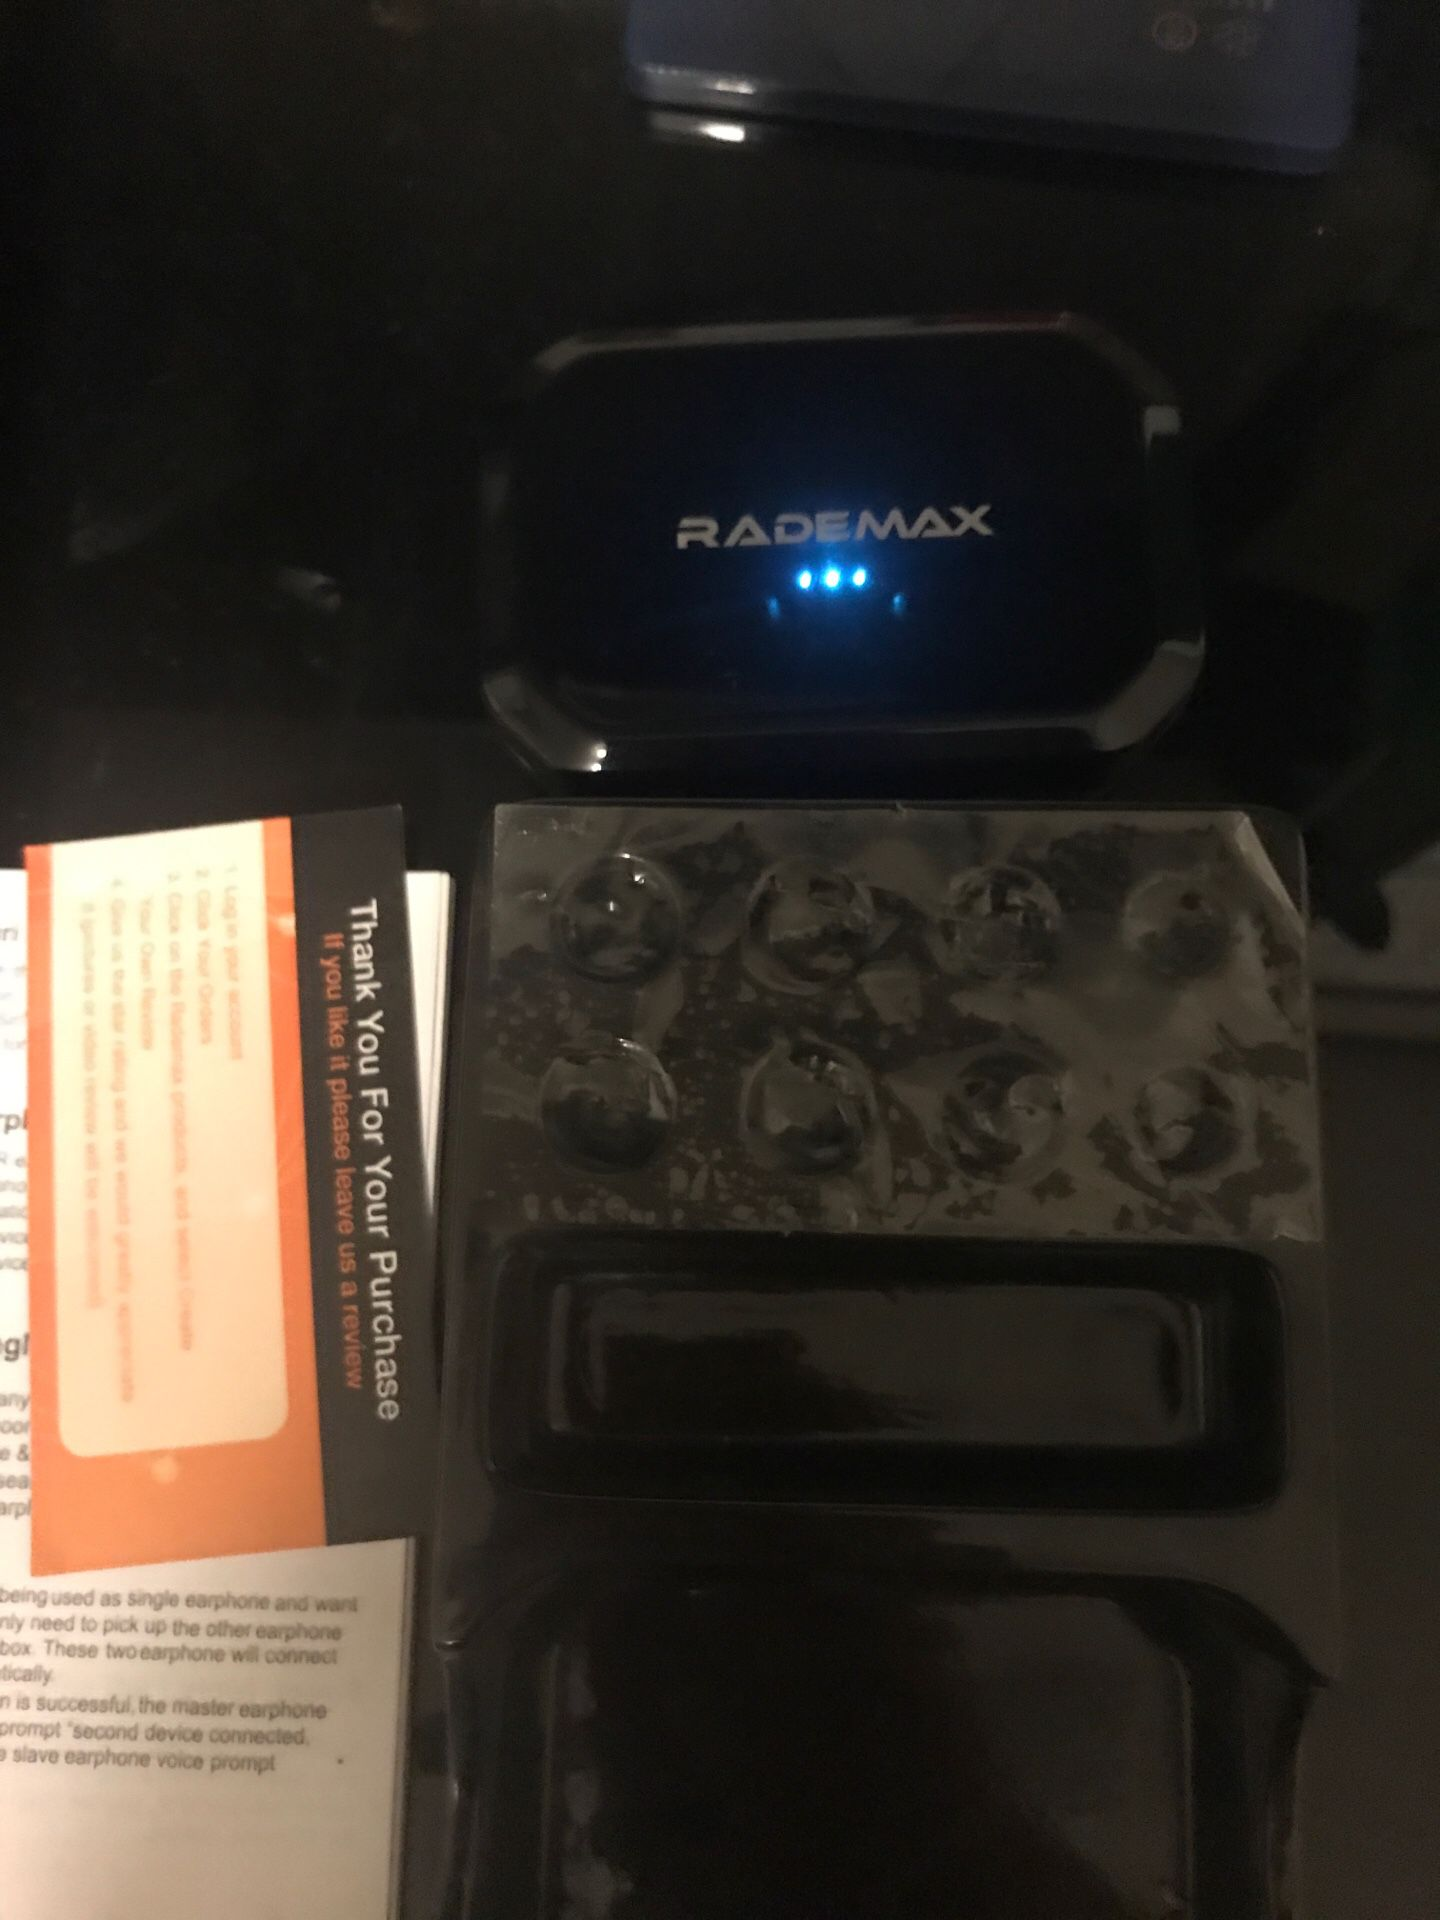 Cre8sounds rademax